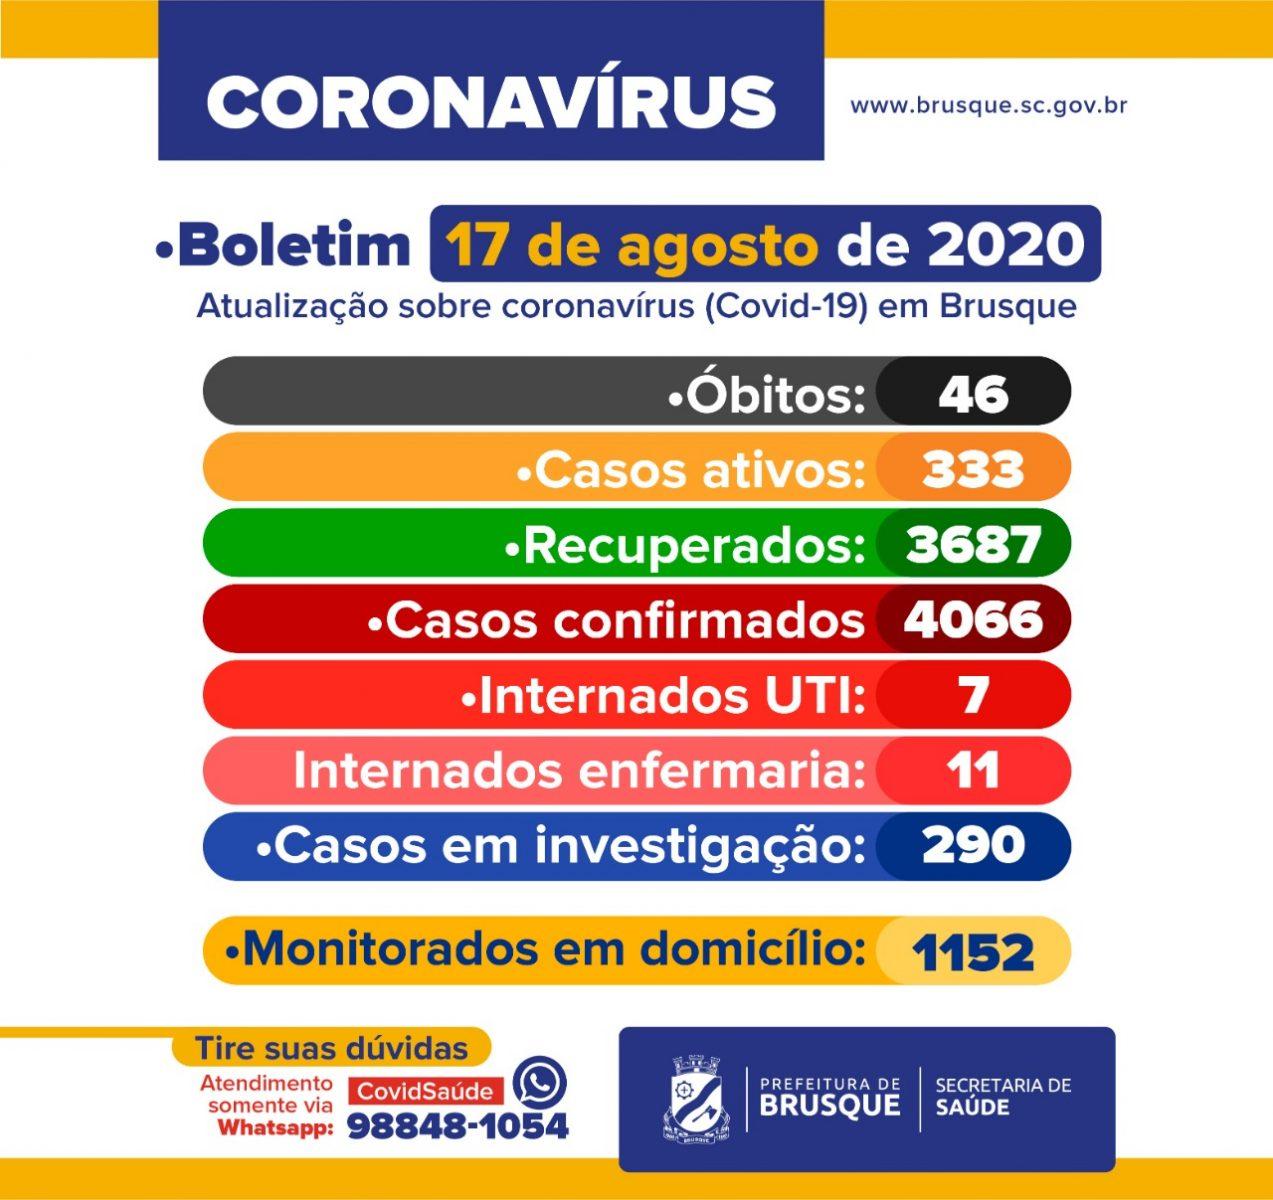 COVID-19: Boletim epidemiológico 17 de agosto